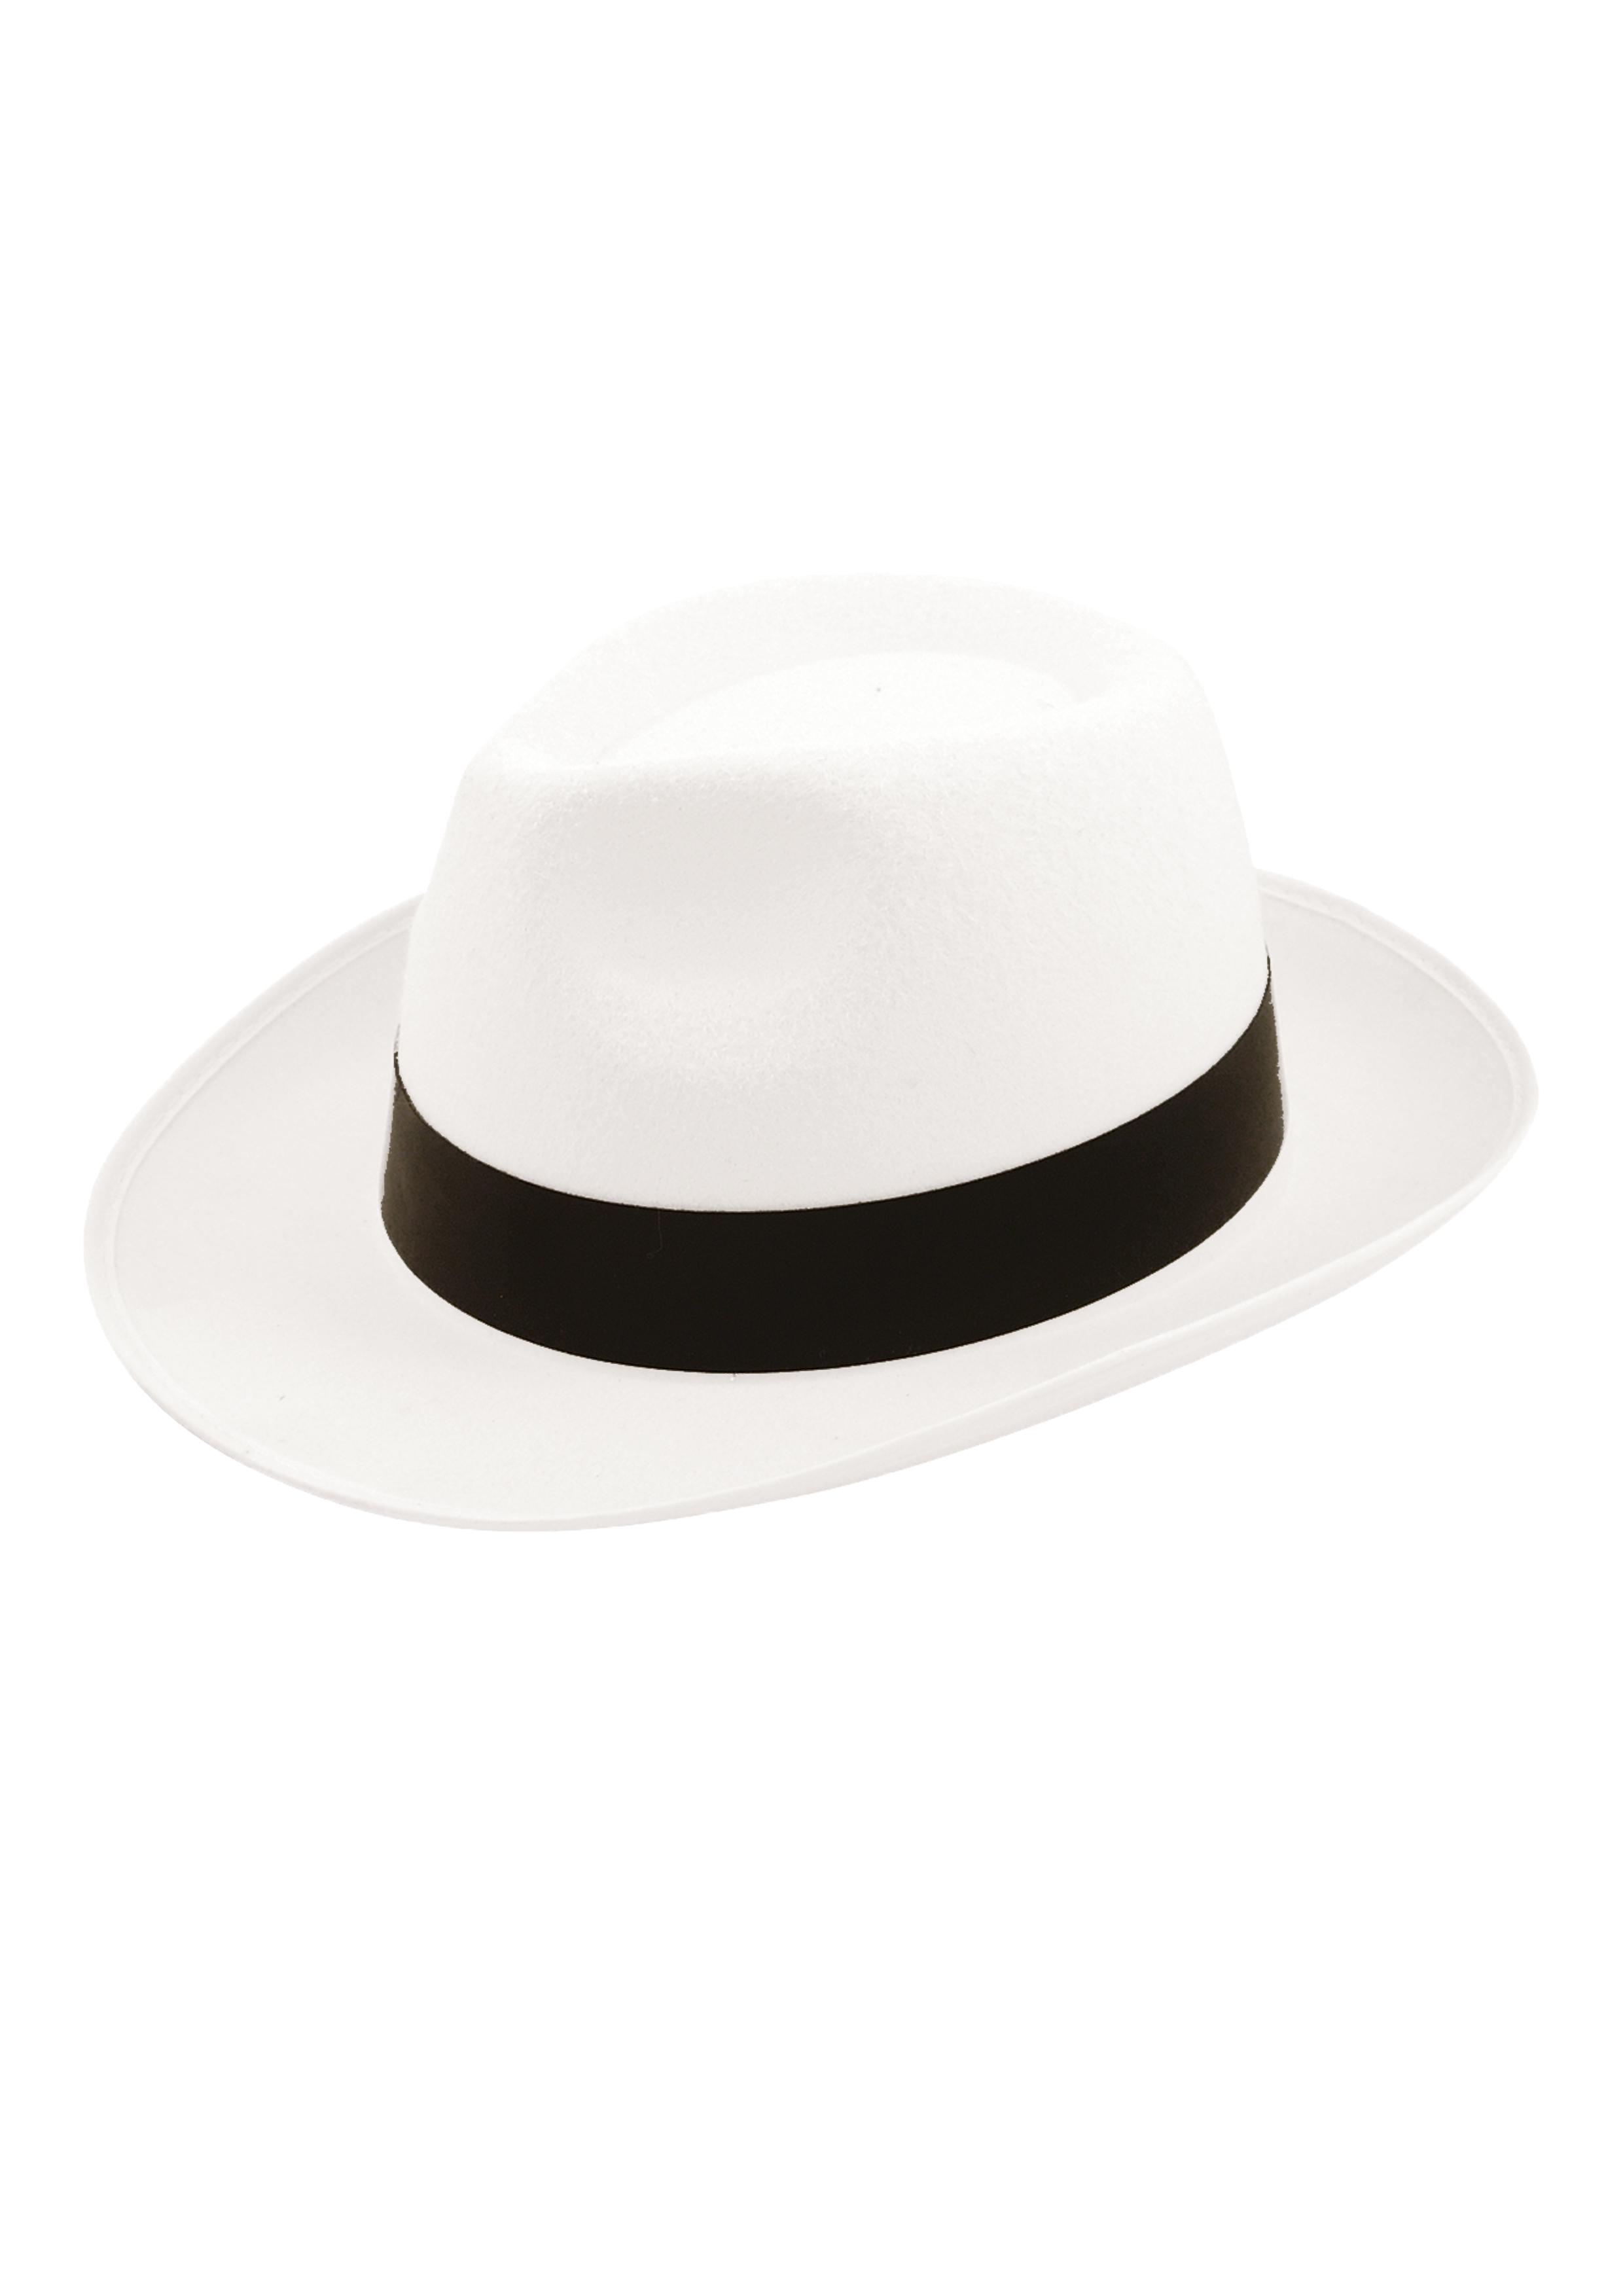 Hat Al Capone/Gangster White